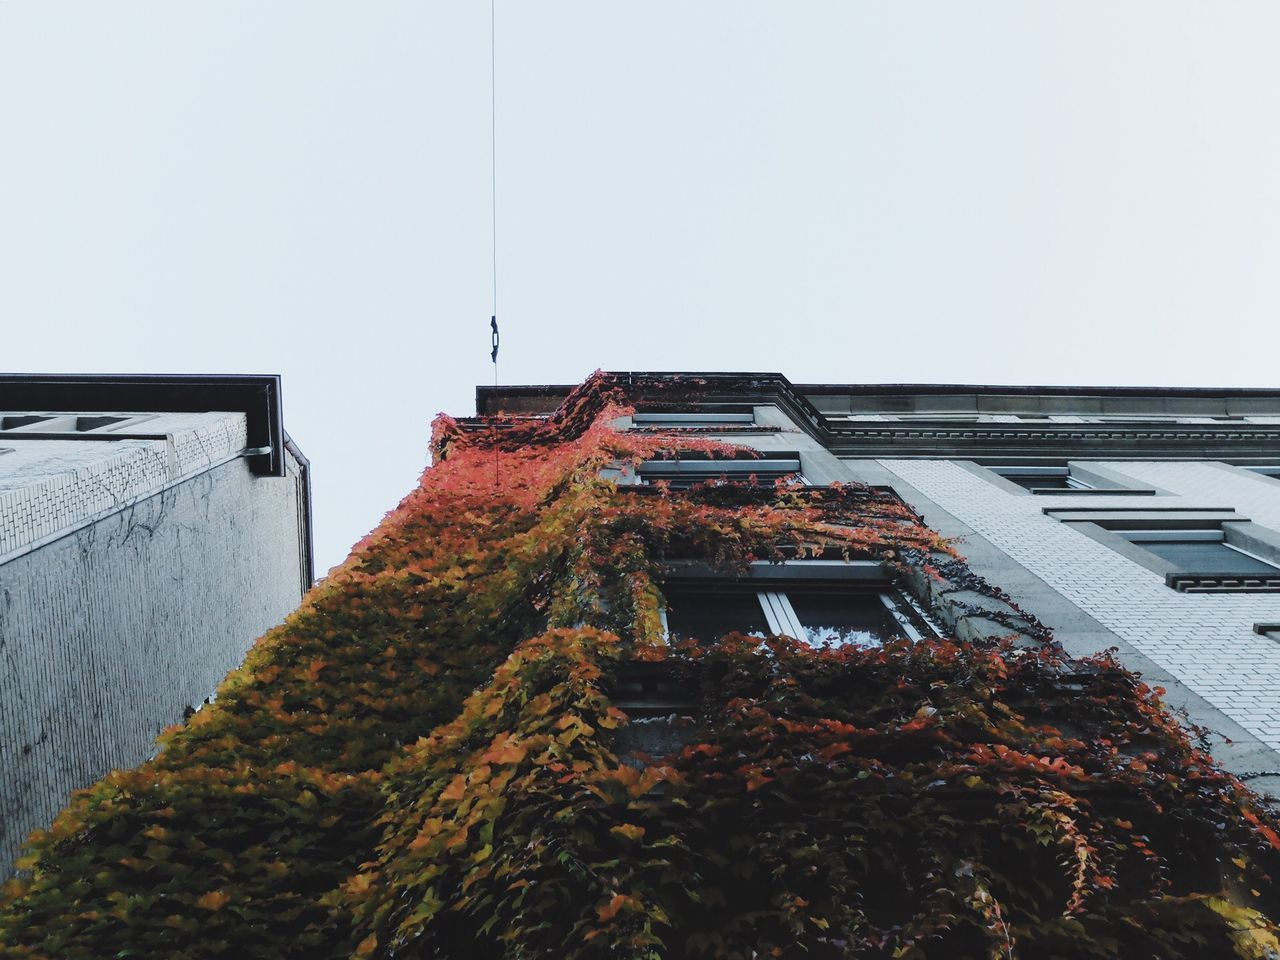 Autumn Autumn Colors Autumn Leaves Architecture Architecture_collection City Urban Geometry Urbanphotography Nature Nature_collection Showcase: November